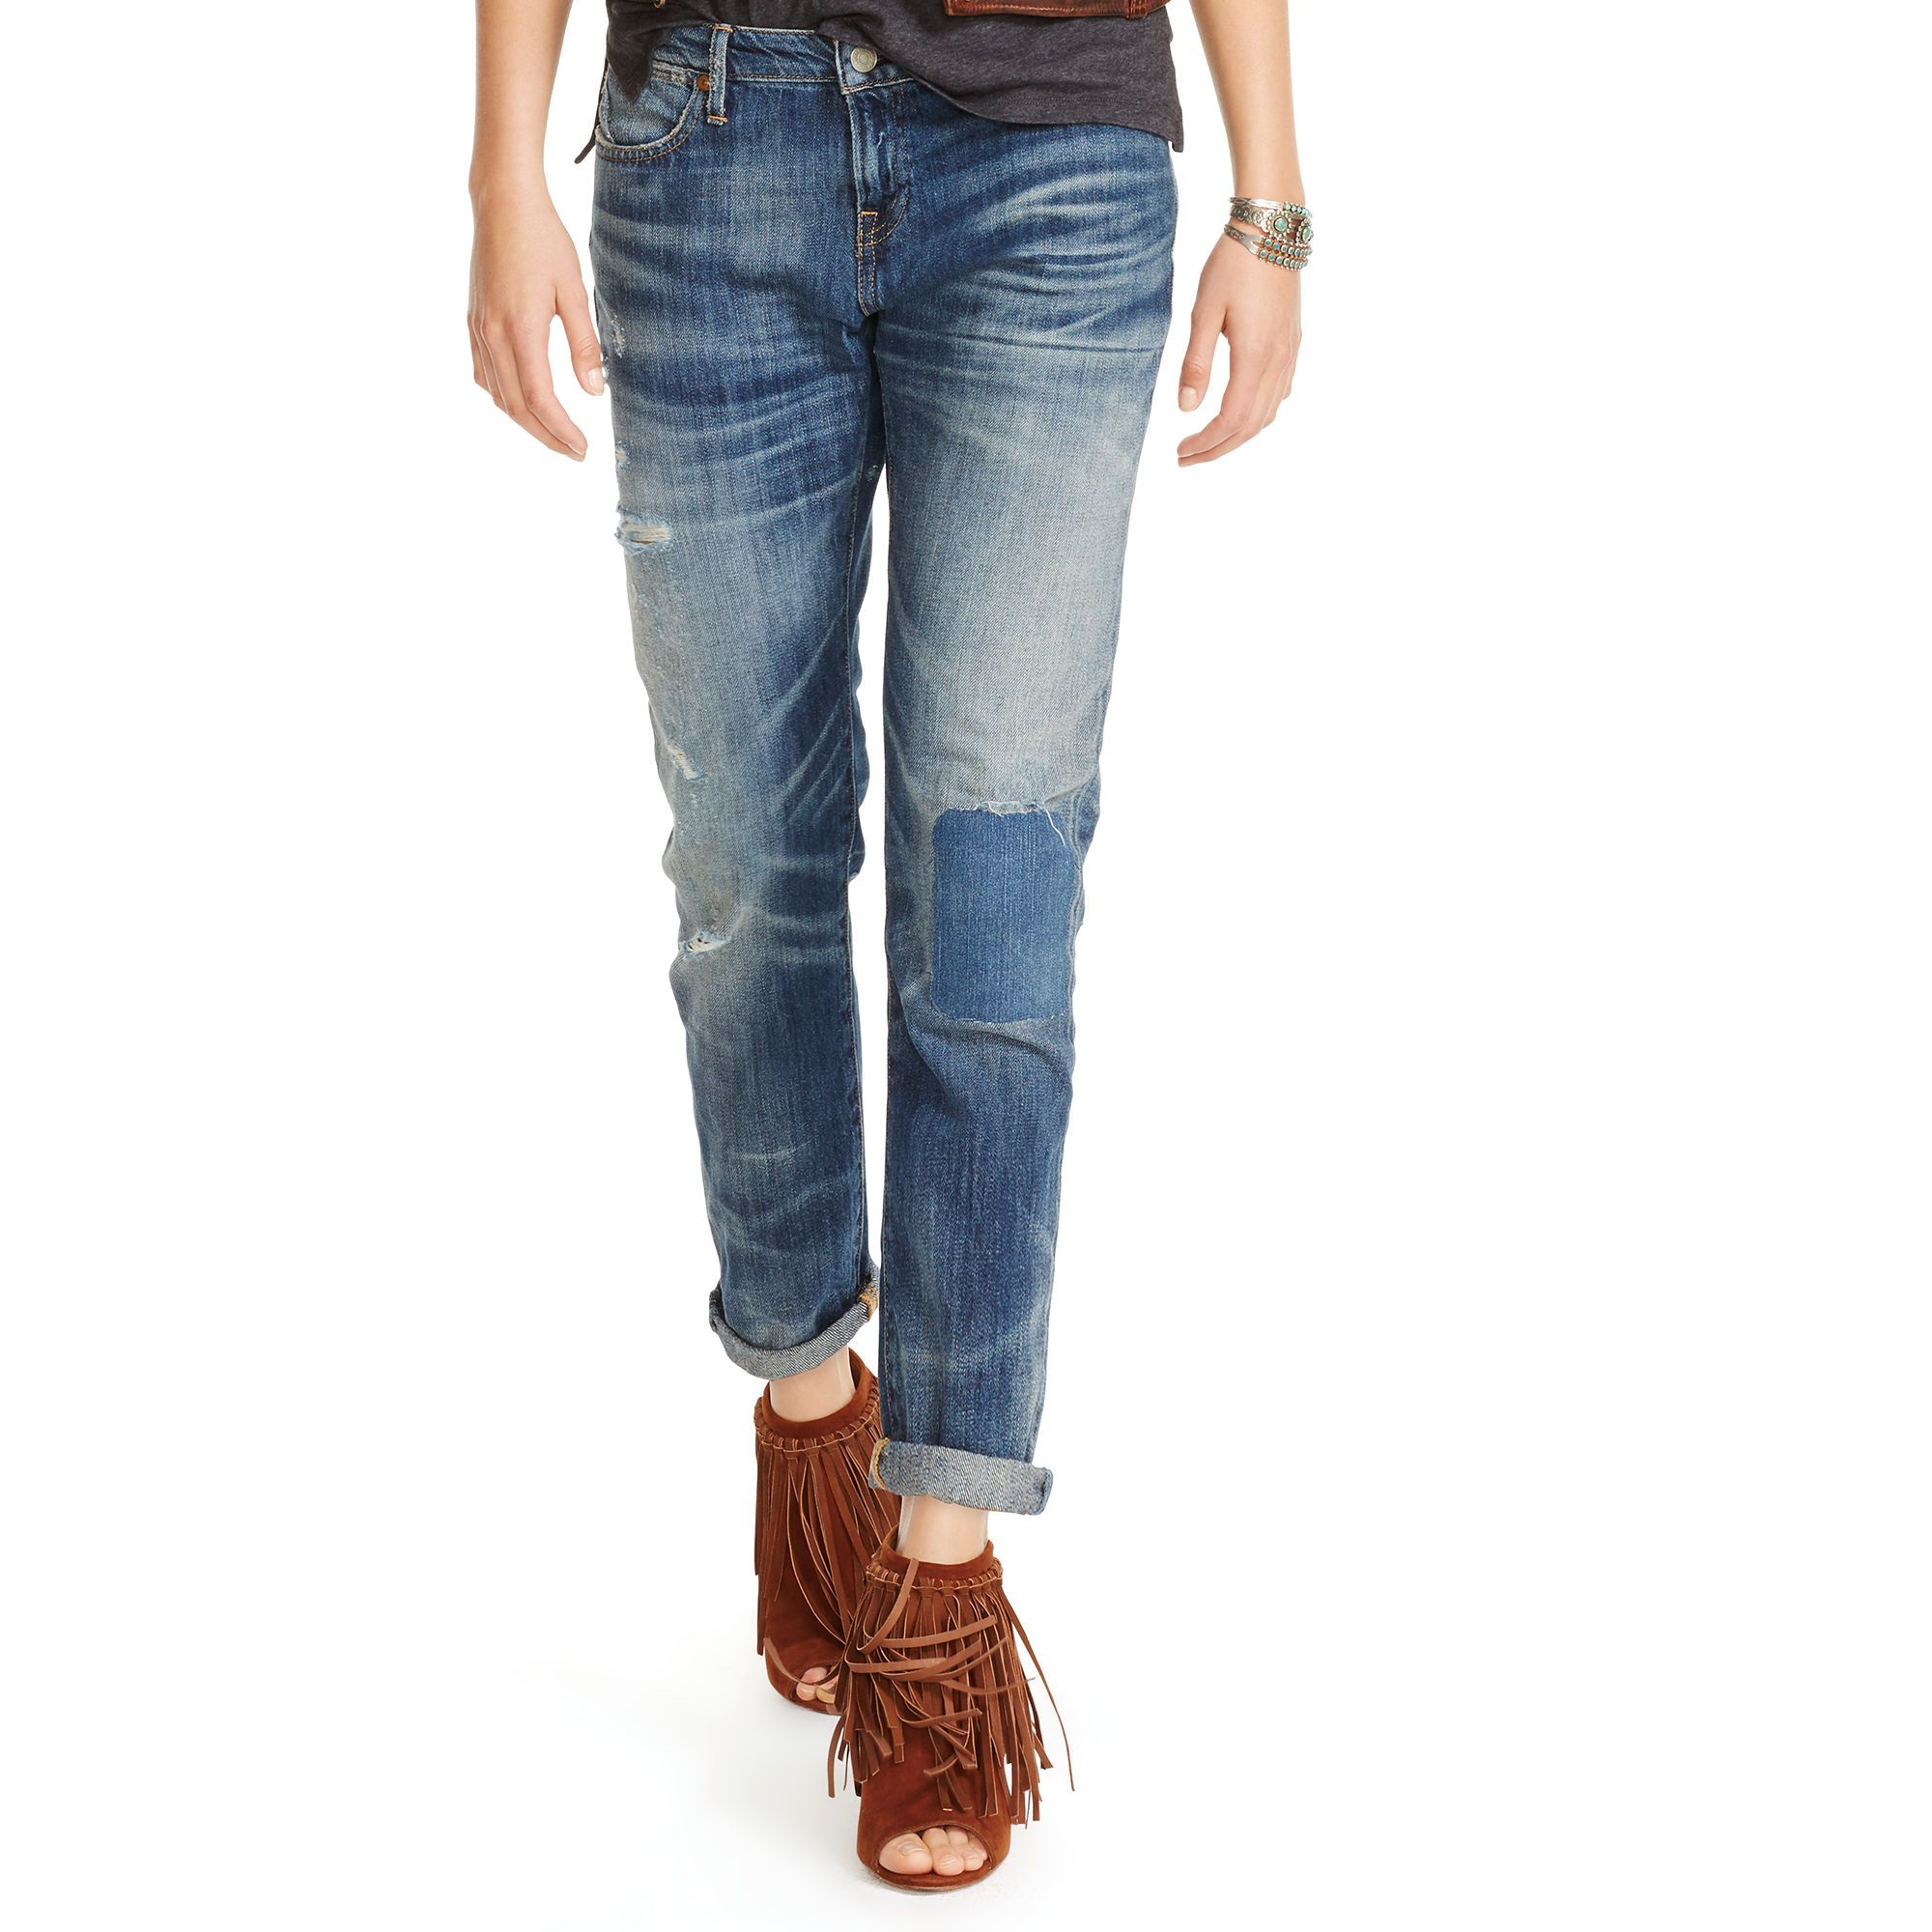 Polo Ralph Lauren Slim-Fit Boyfriend Jeans, Jettson Paint